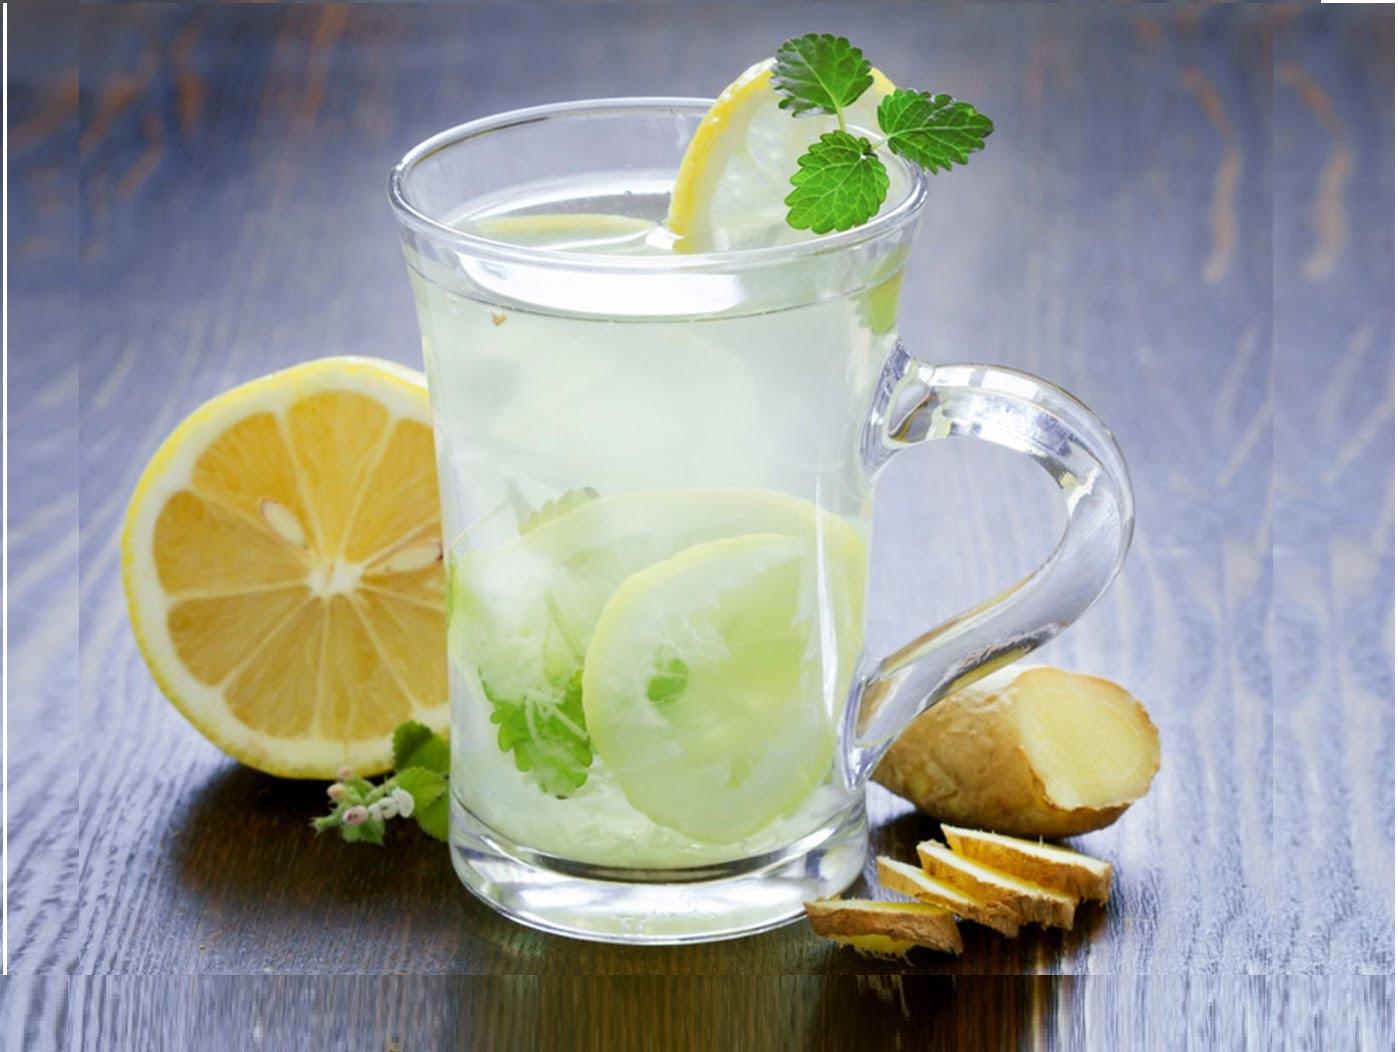 ricetta di dieta di limone detox